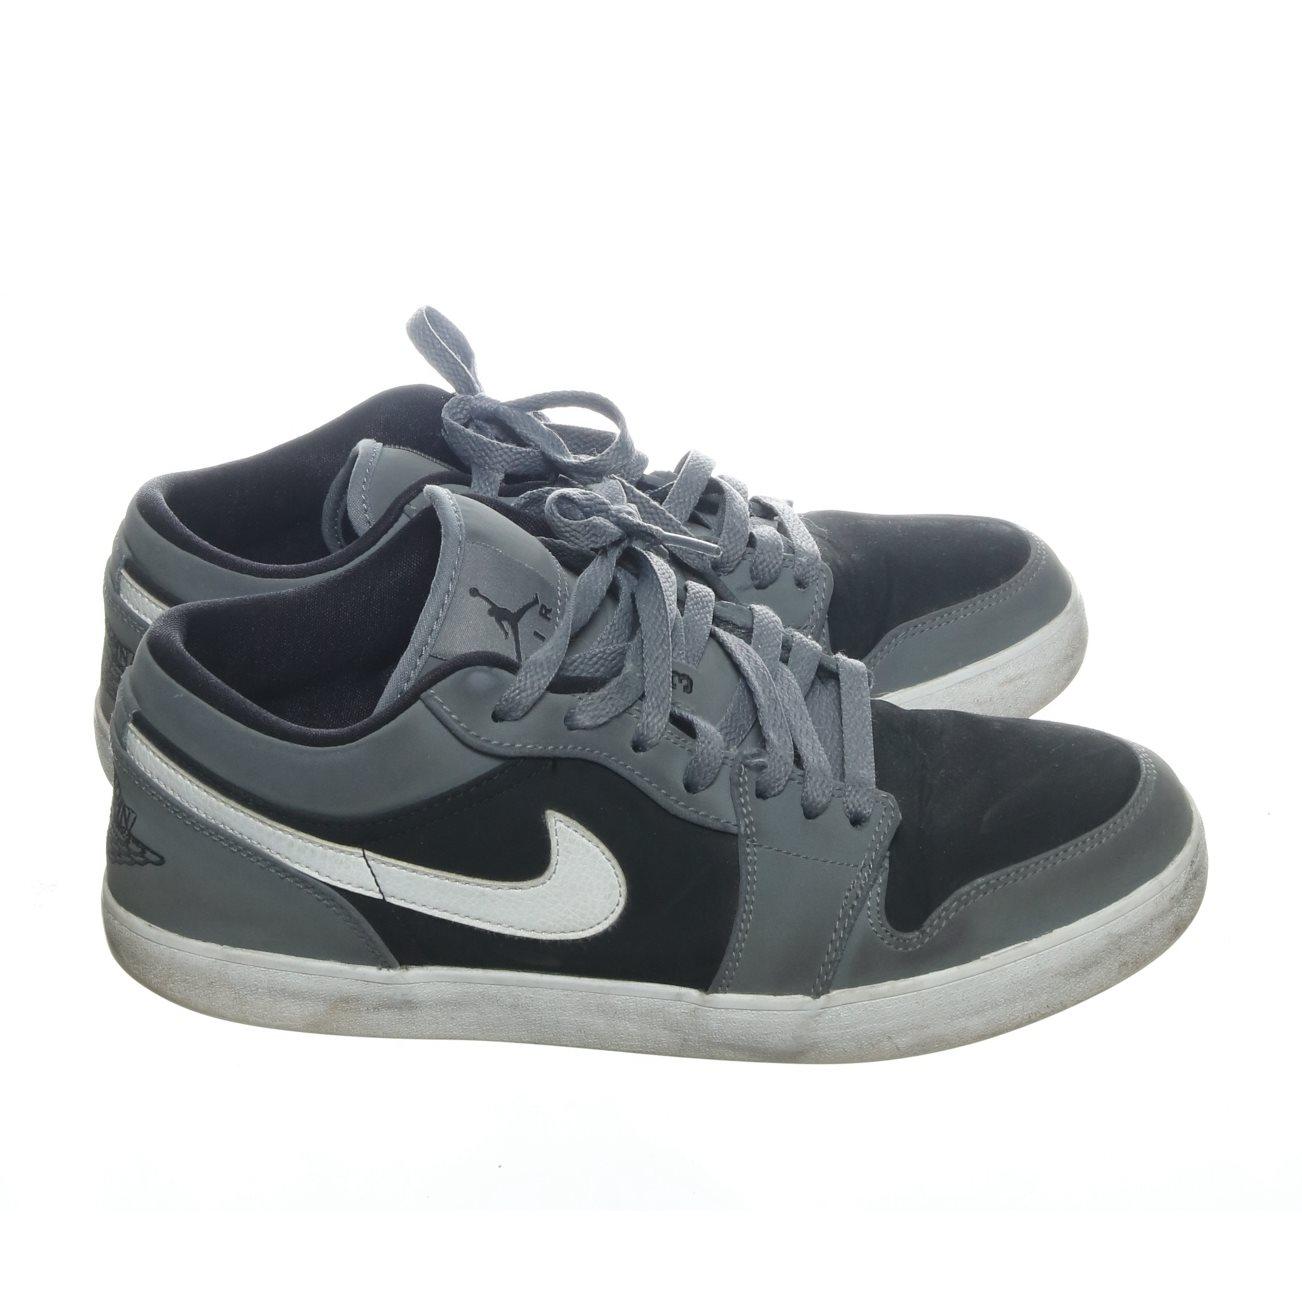 best sneakers cfd88 a7fb0 Nike Air Jordan, Sneakers, Strl  44.5, Svart Grå